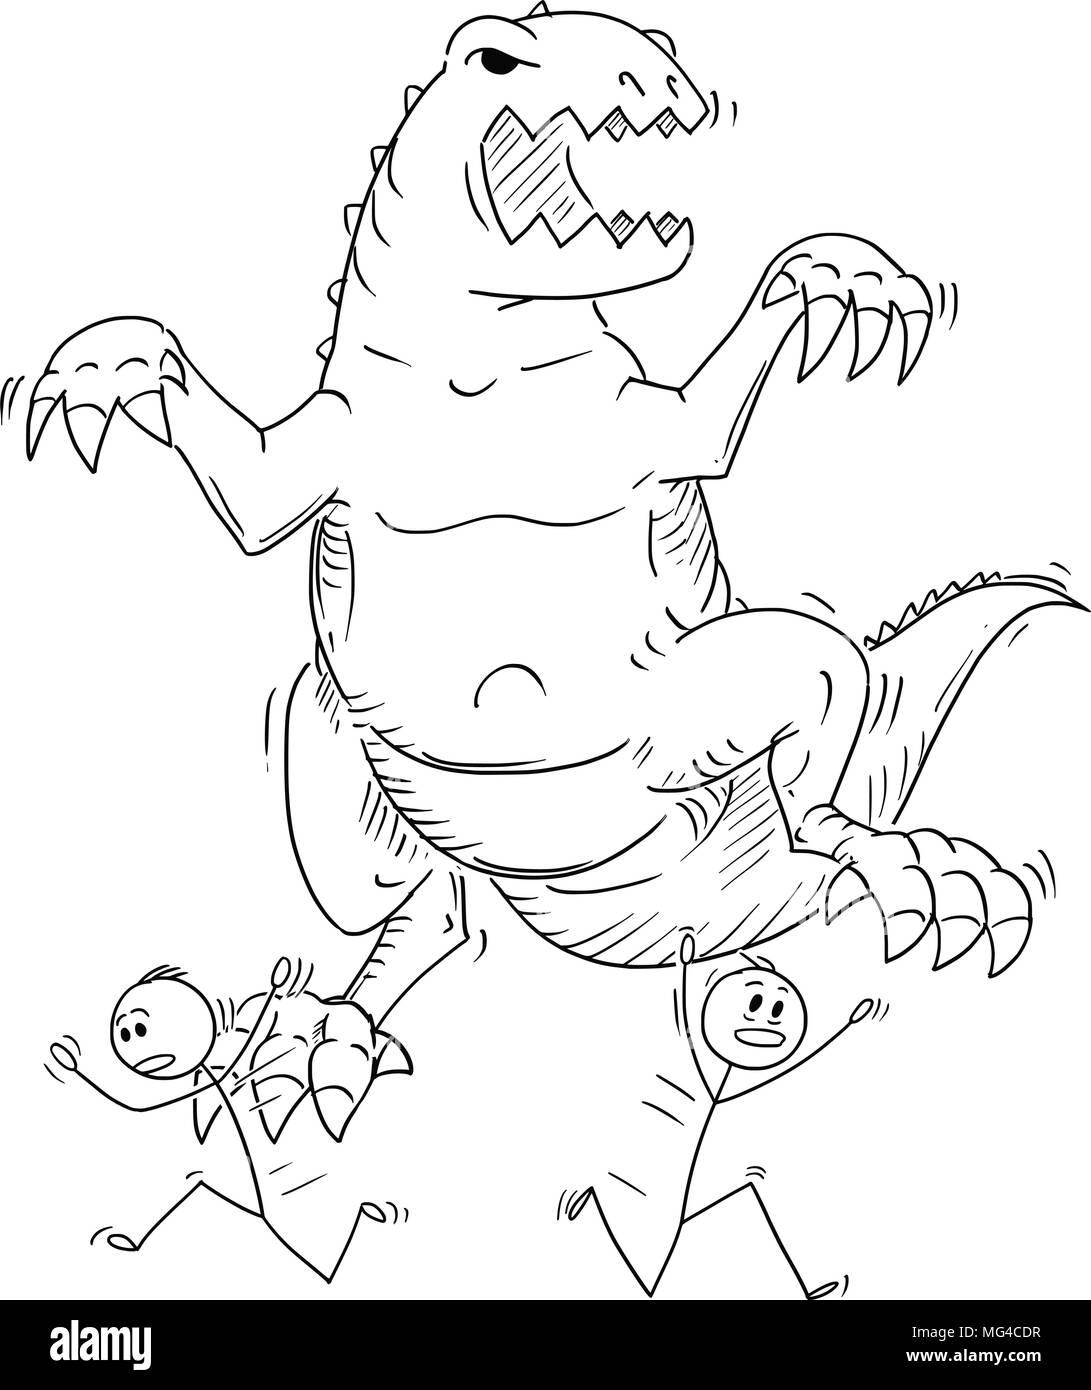 Cartoon of People or Businessmen Running Away From Monster Dinosaur Godzilla Creature - Stock Image